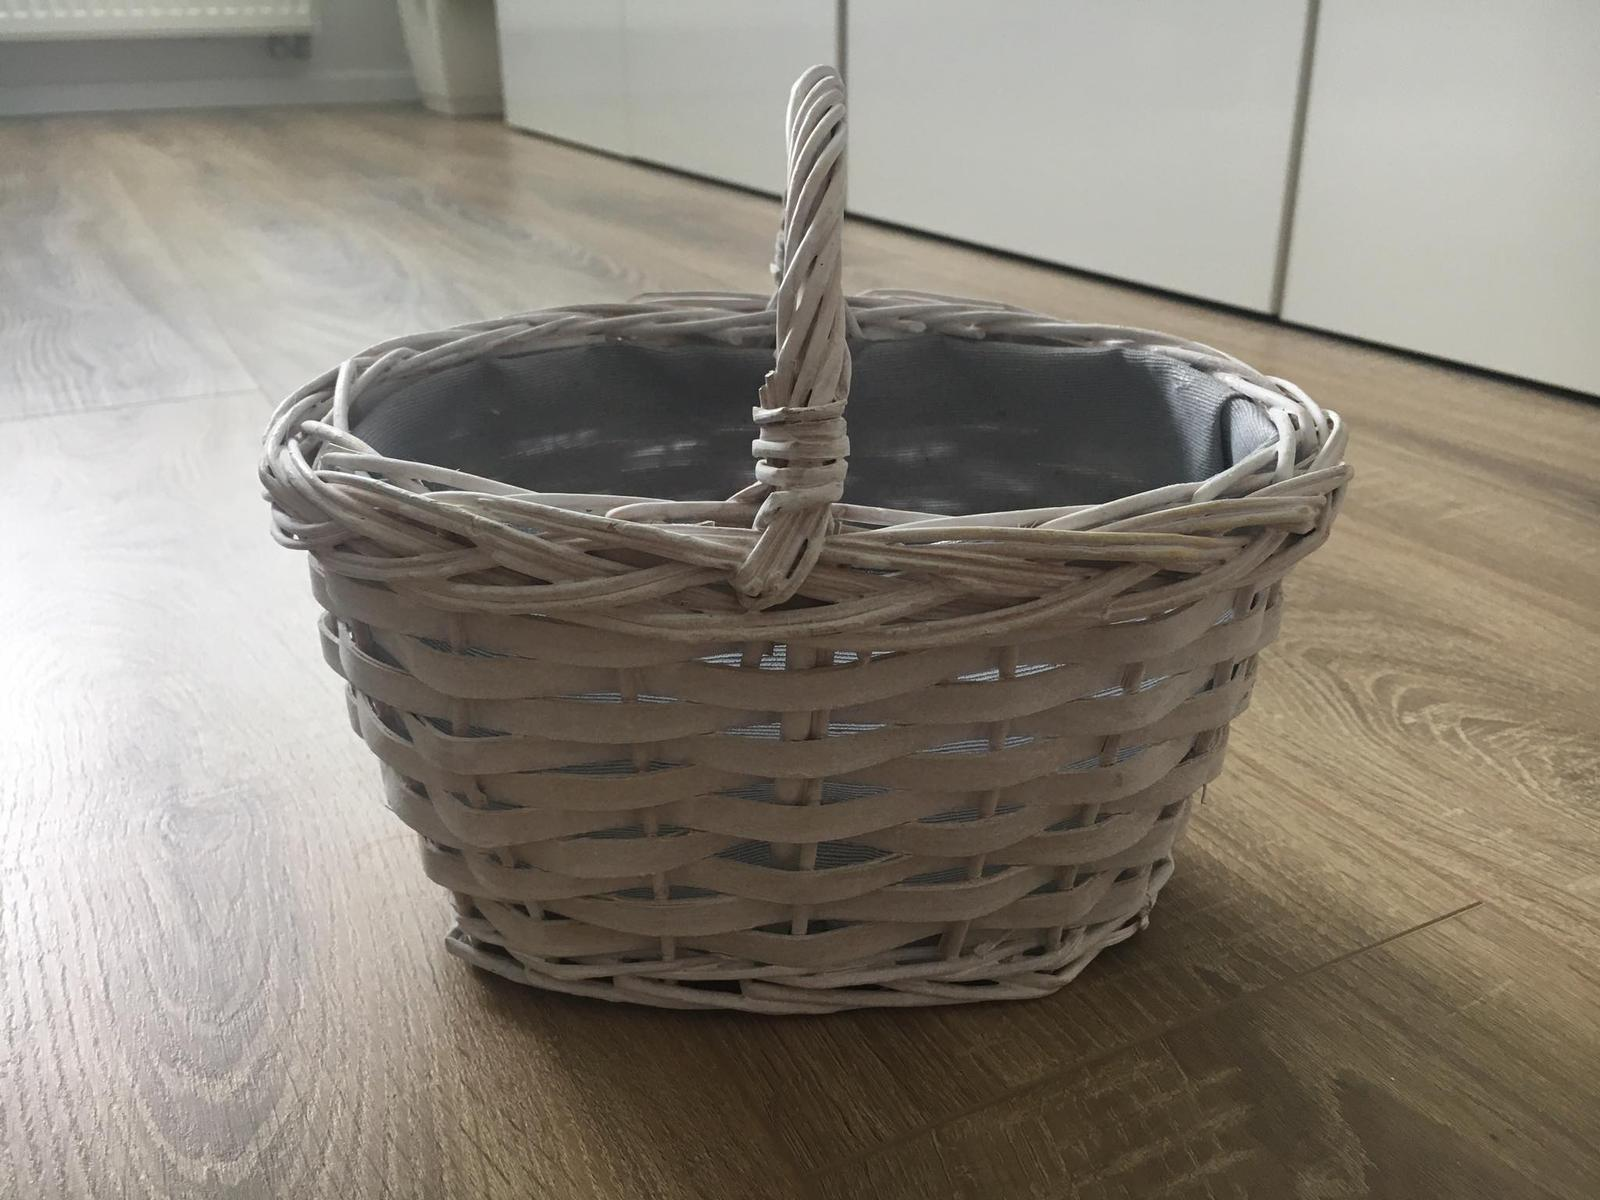 Biely košík - Obrázok č. 1